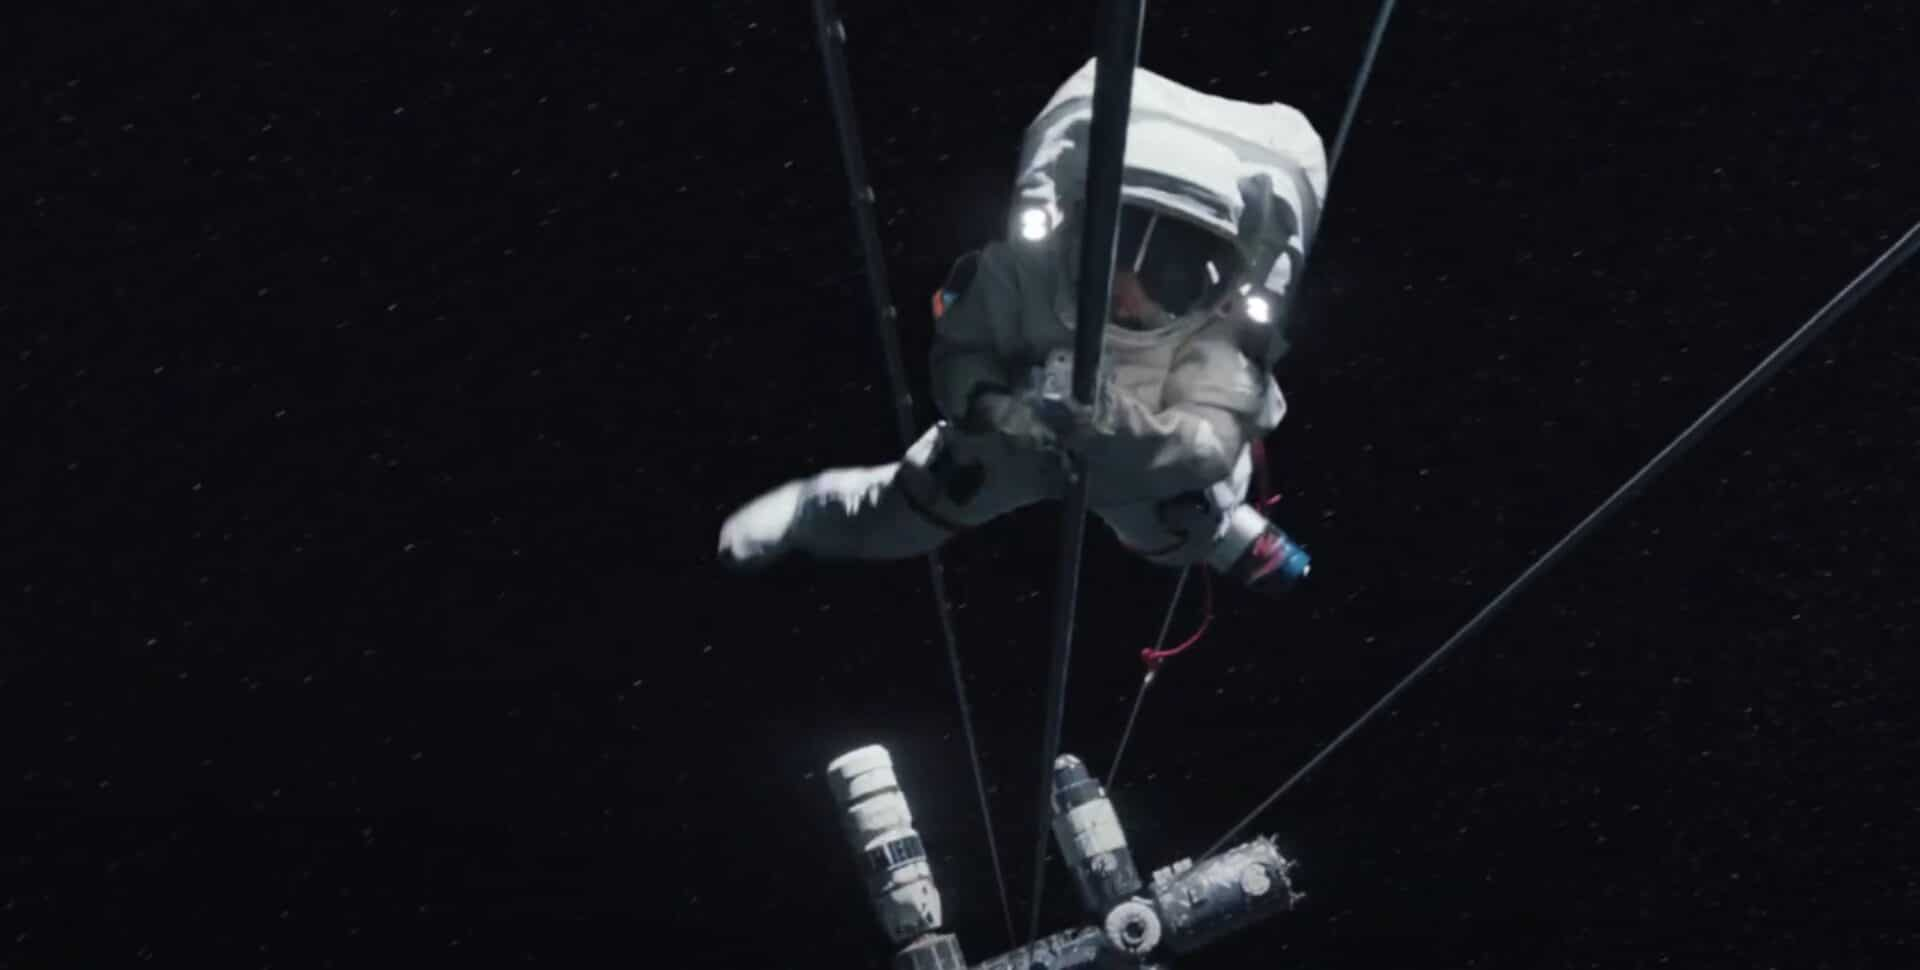 Stowaway Netflix original film thriller space ruimte